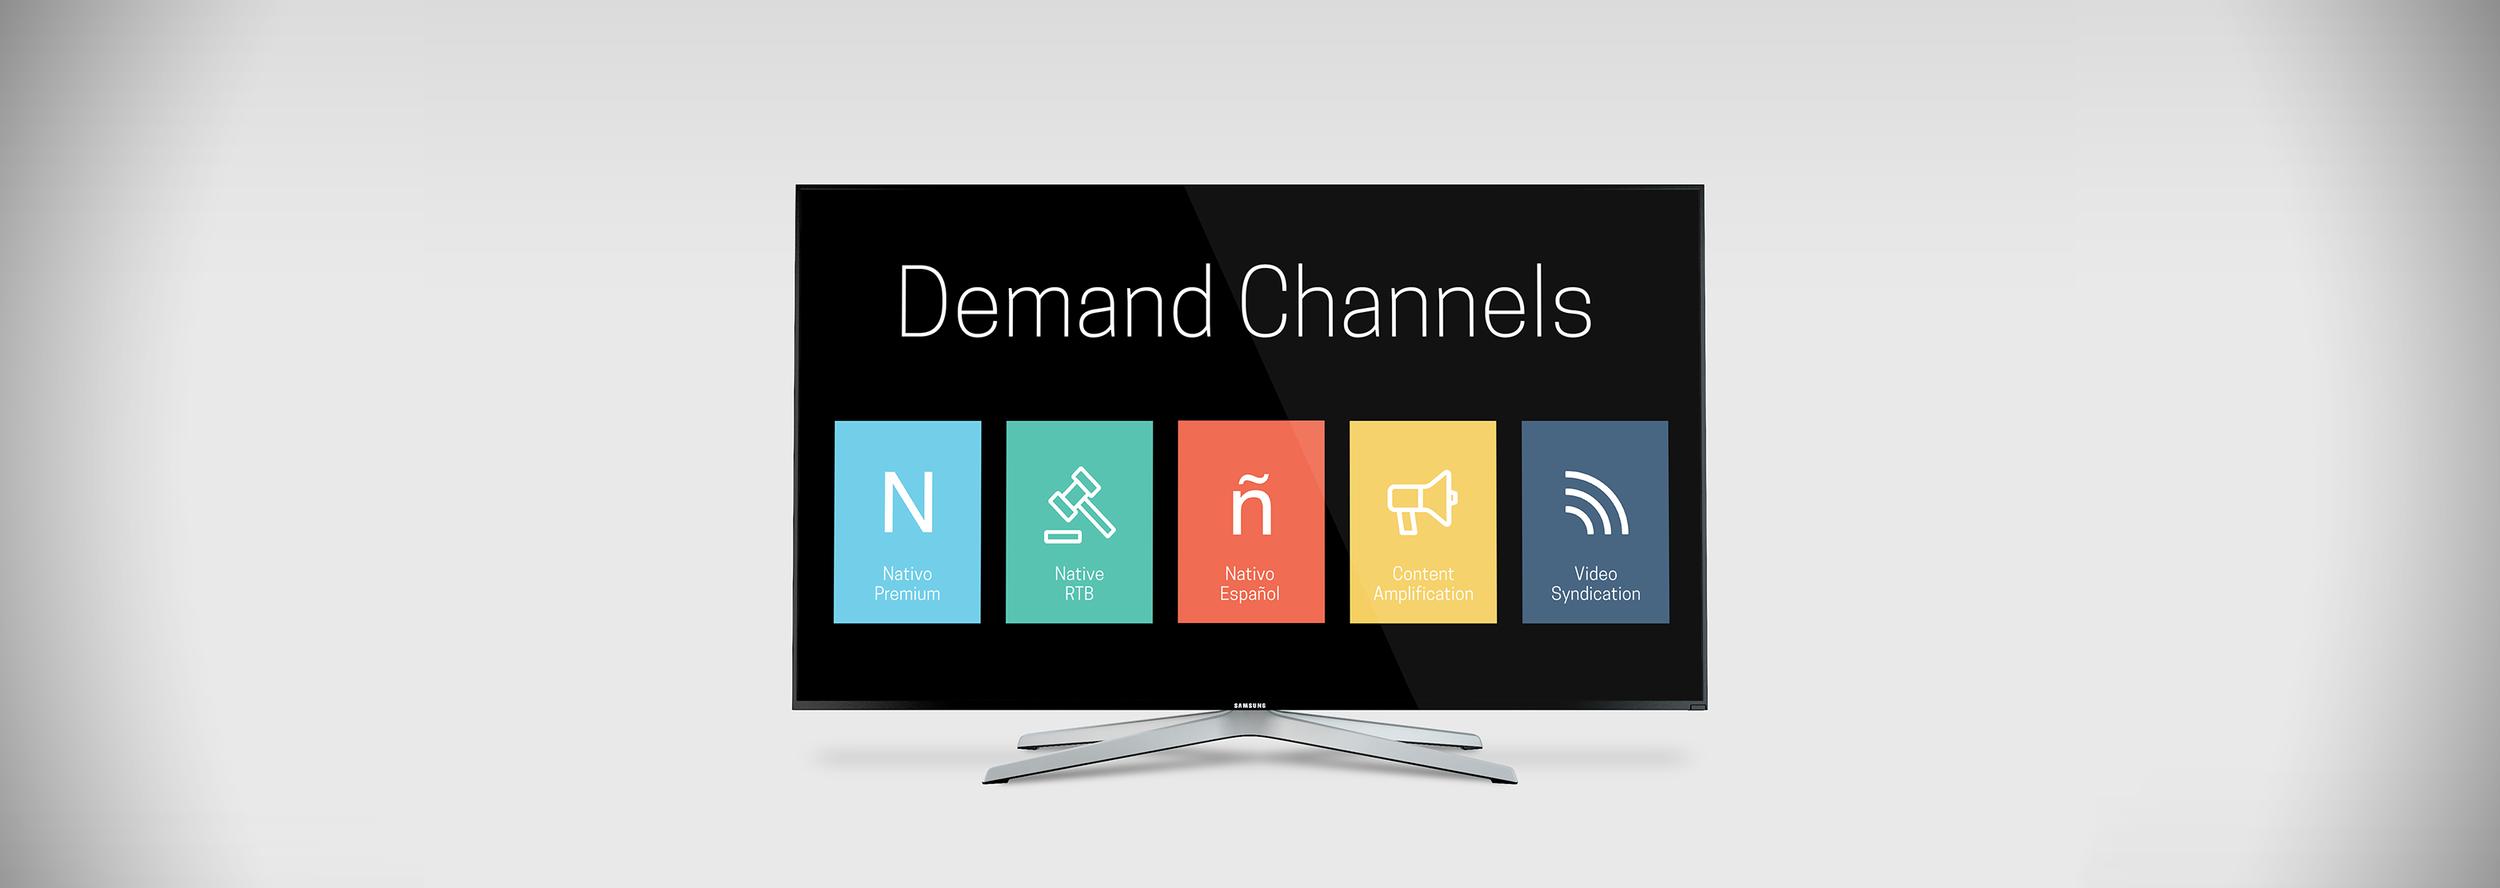 Demand-Channels.png